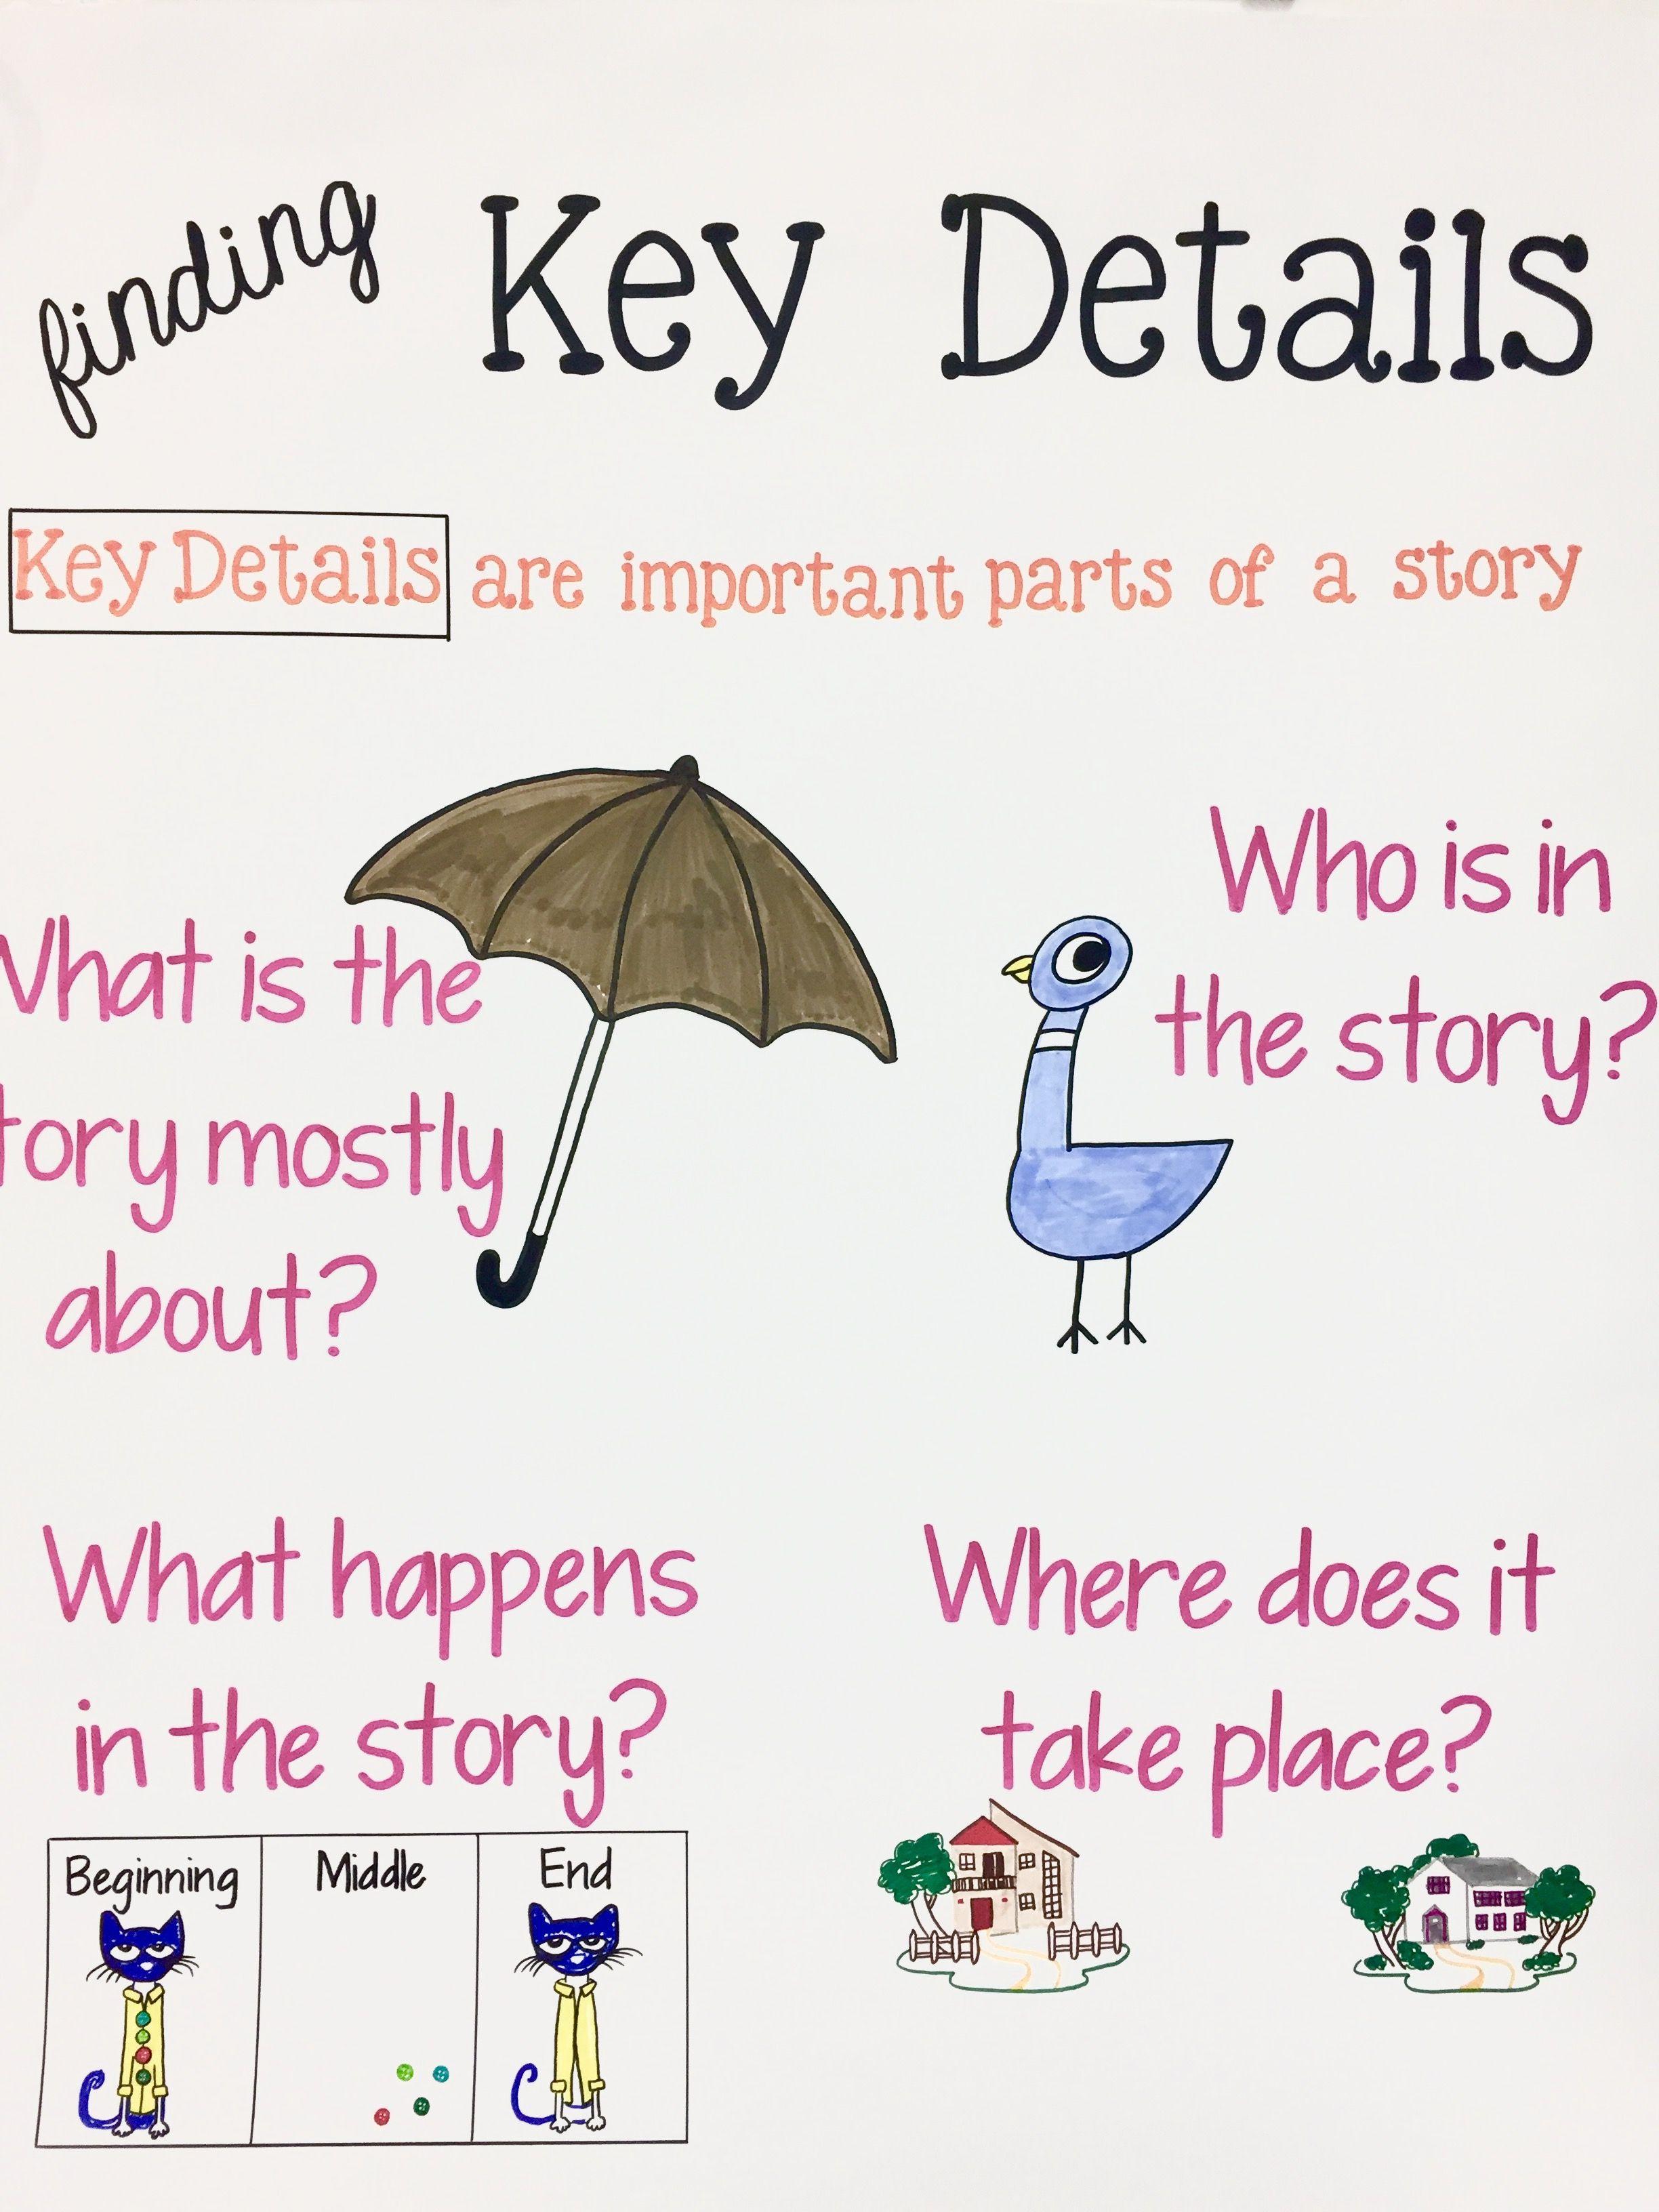 Finding Key Details